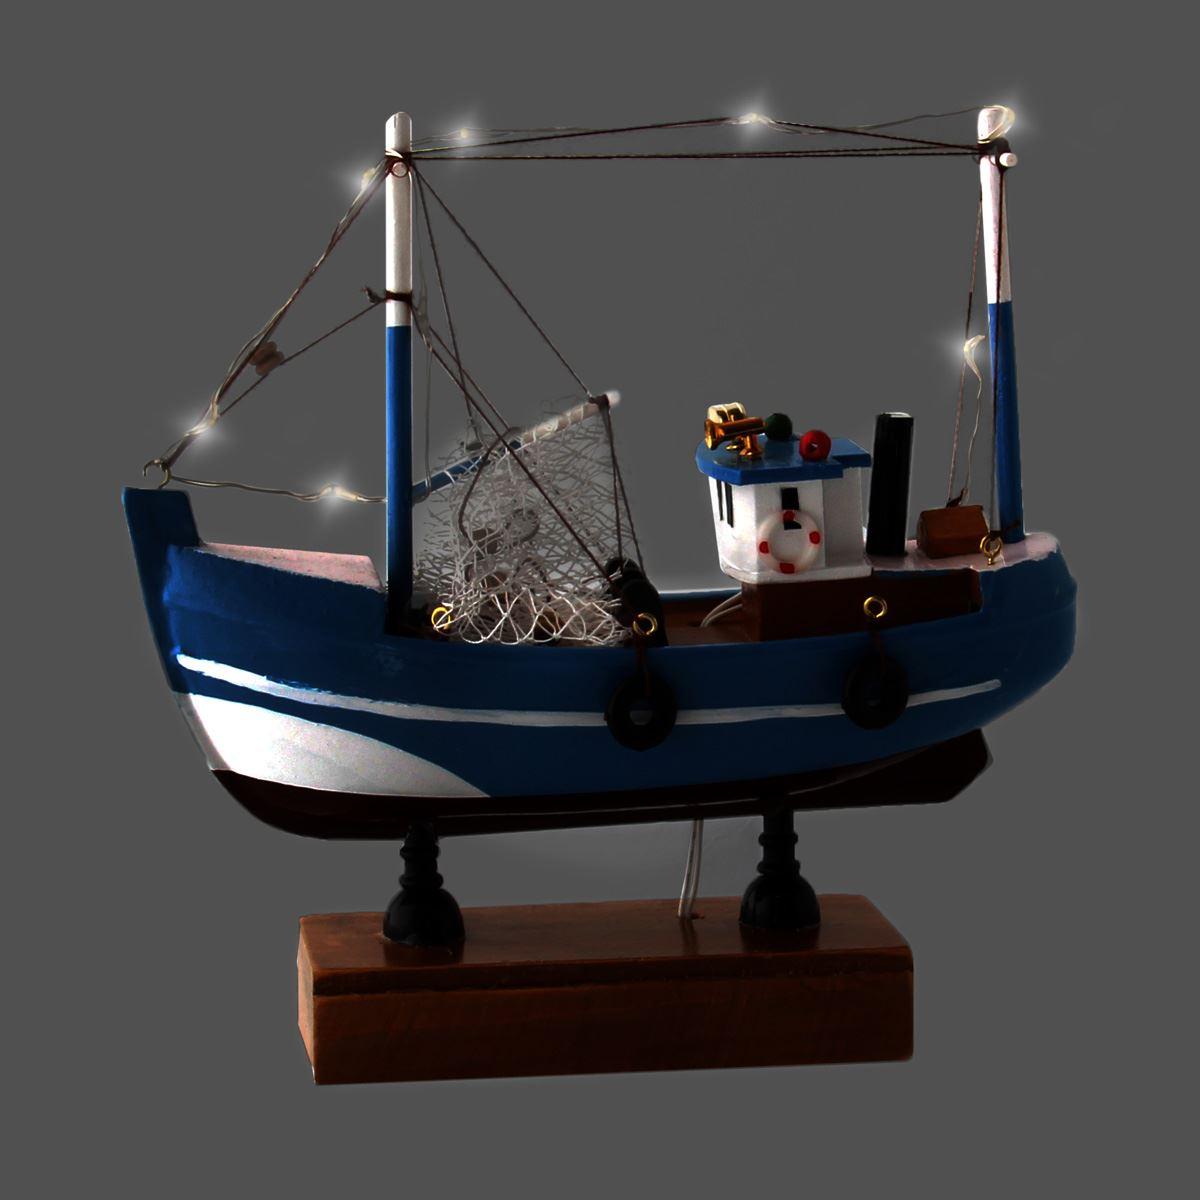 Bote de pesca con luz led  - Sanborns